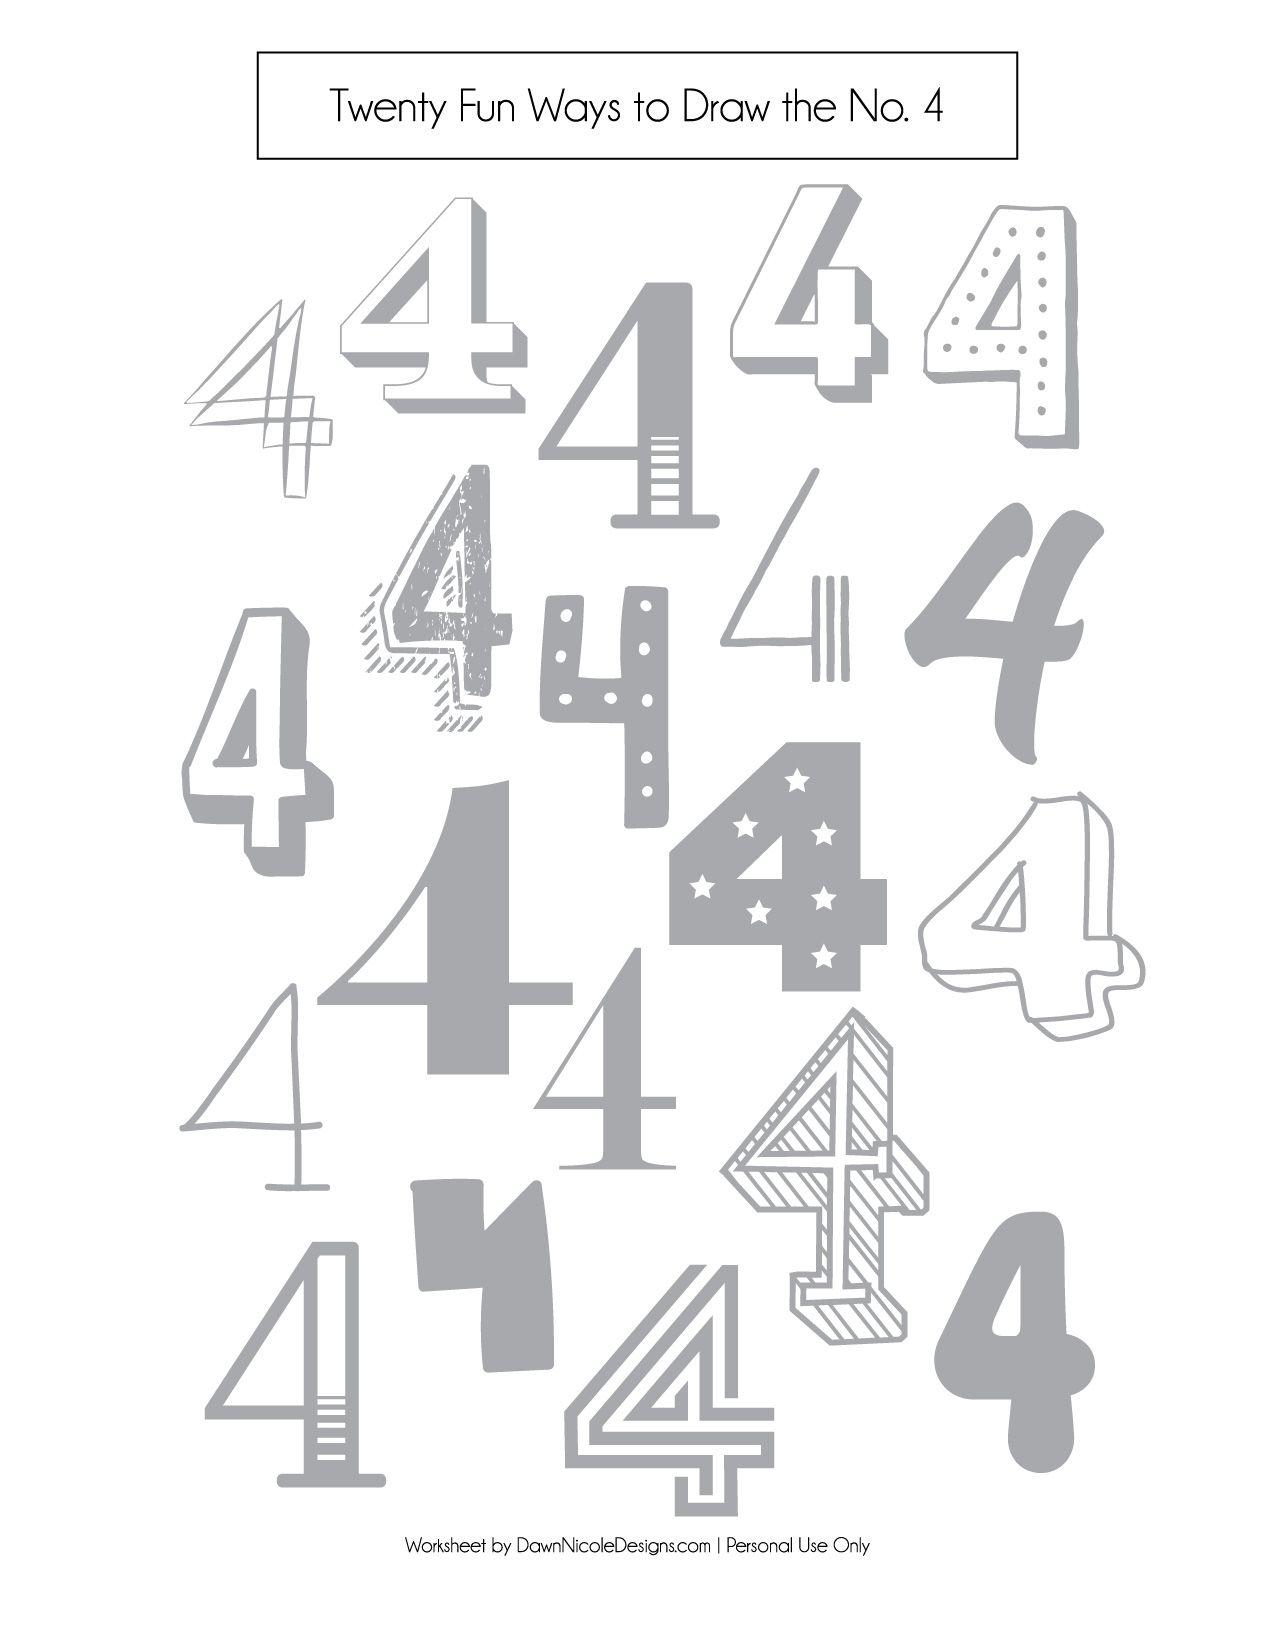 Numbersworksheets No4 01 Copy 1 275 1 650 Pixels